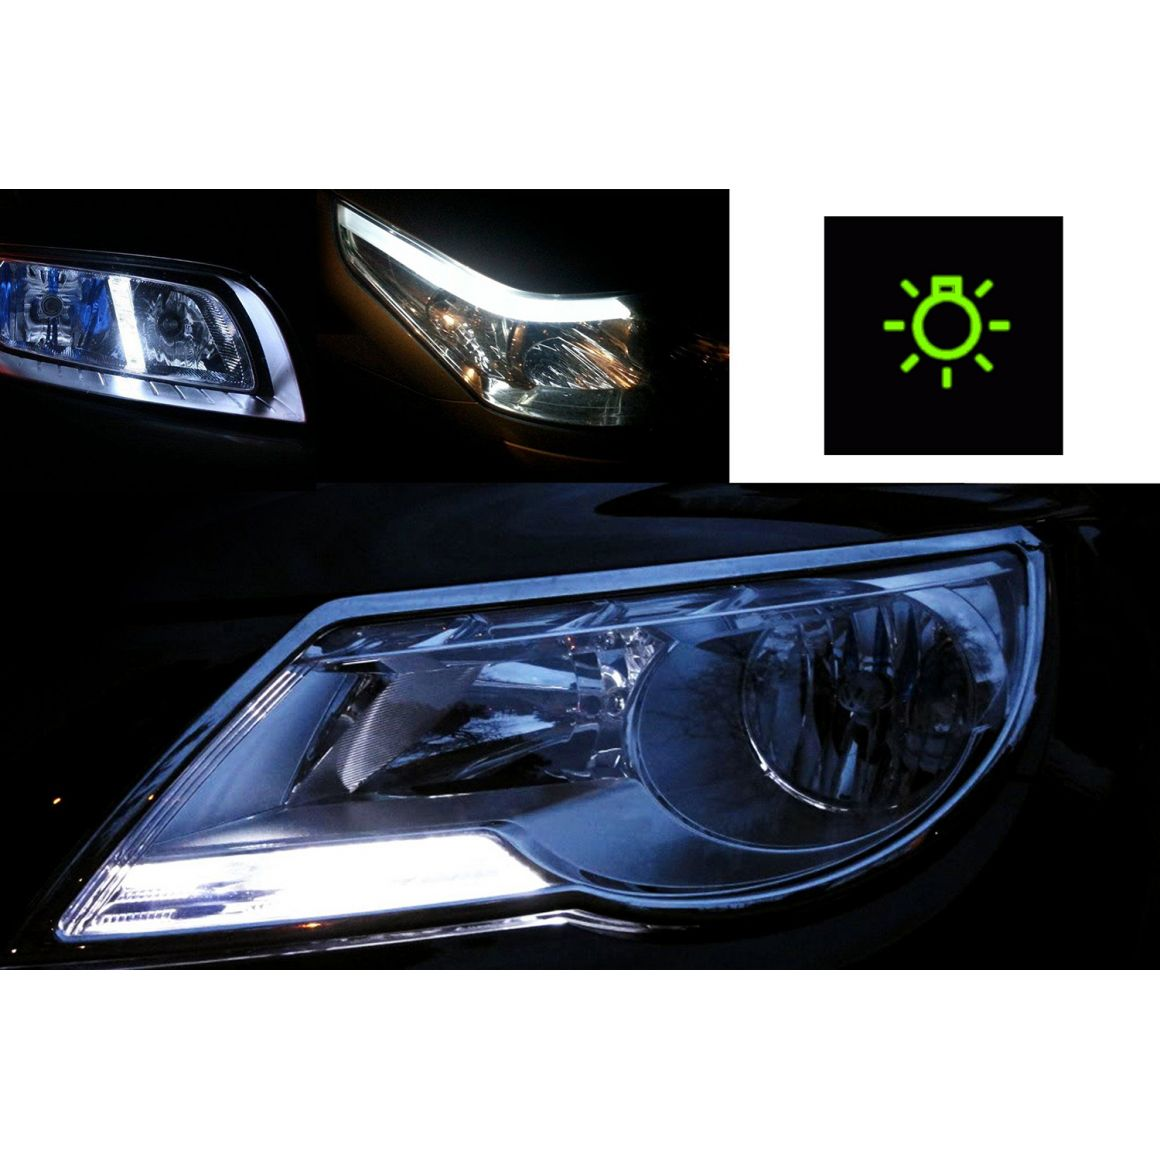 Pack Ampoules Led Veilleuses Pour Hyundai Coupe Gk